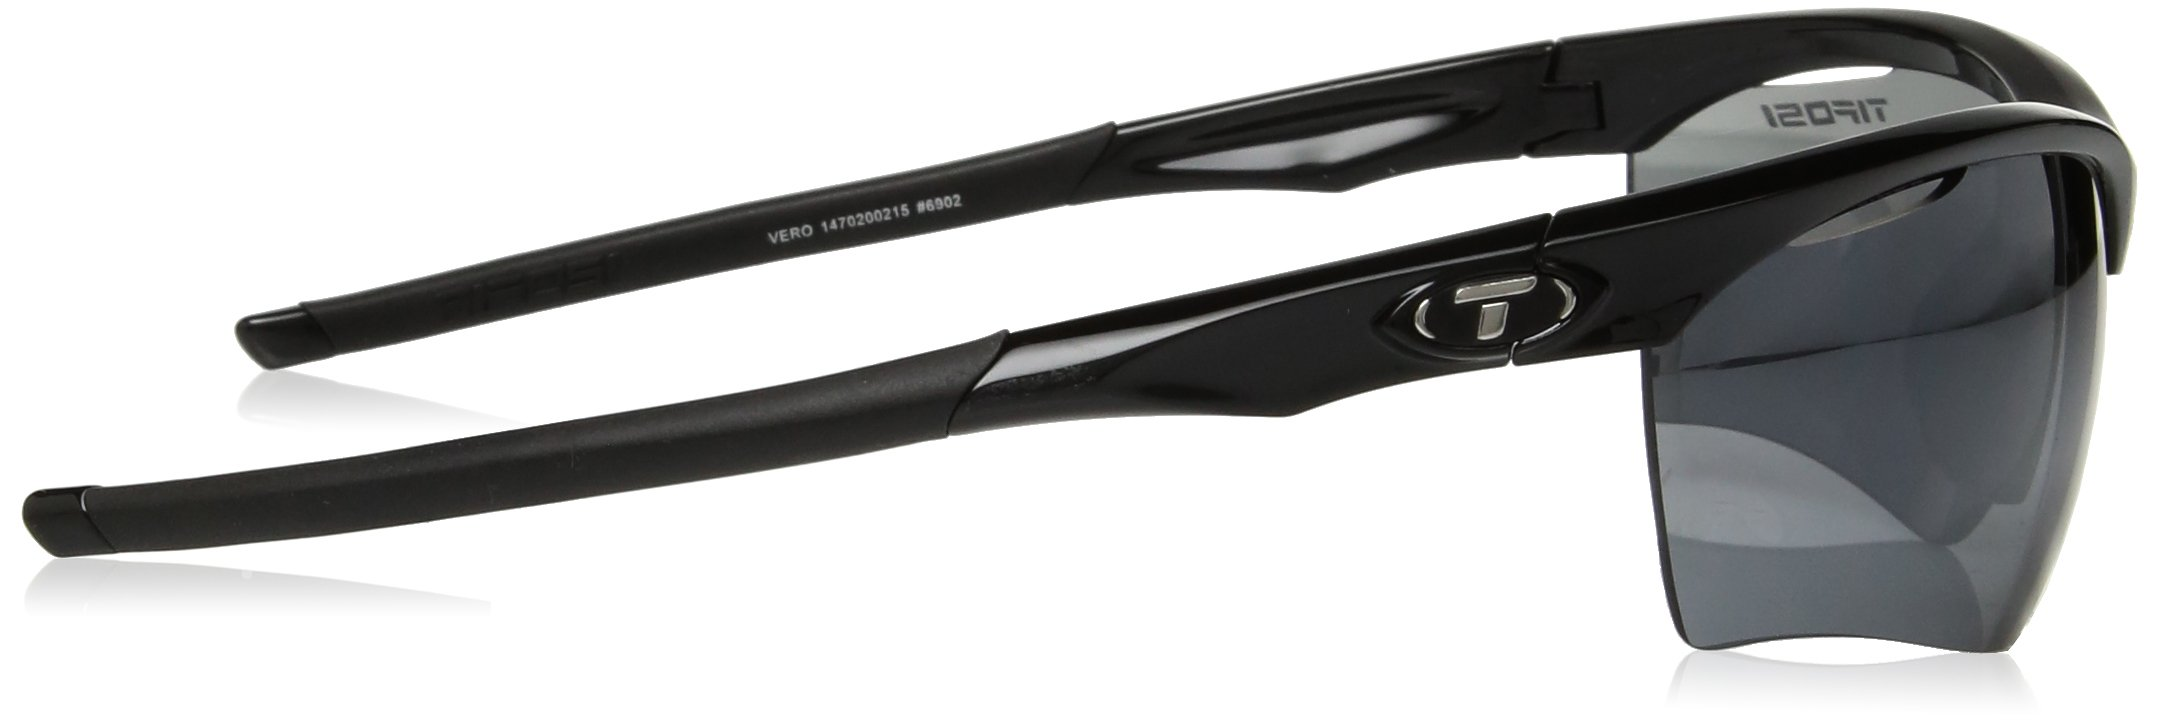 Tifosi Vero Wrap Sunglasses, Gloss Black, 63.8 mm by Tifosi (Image #3)